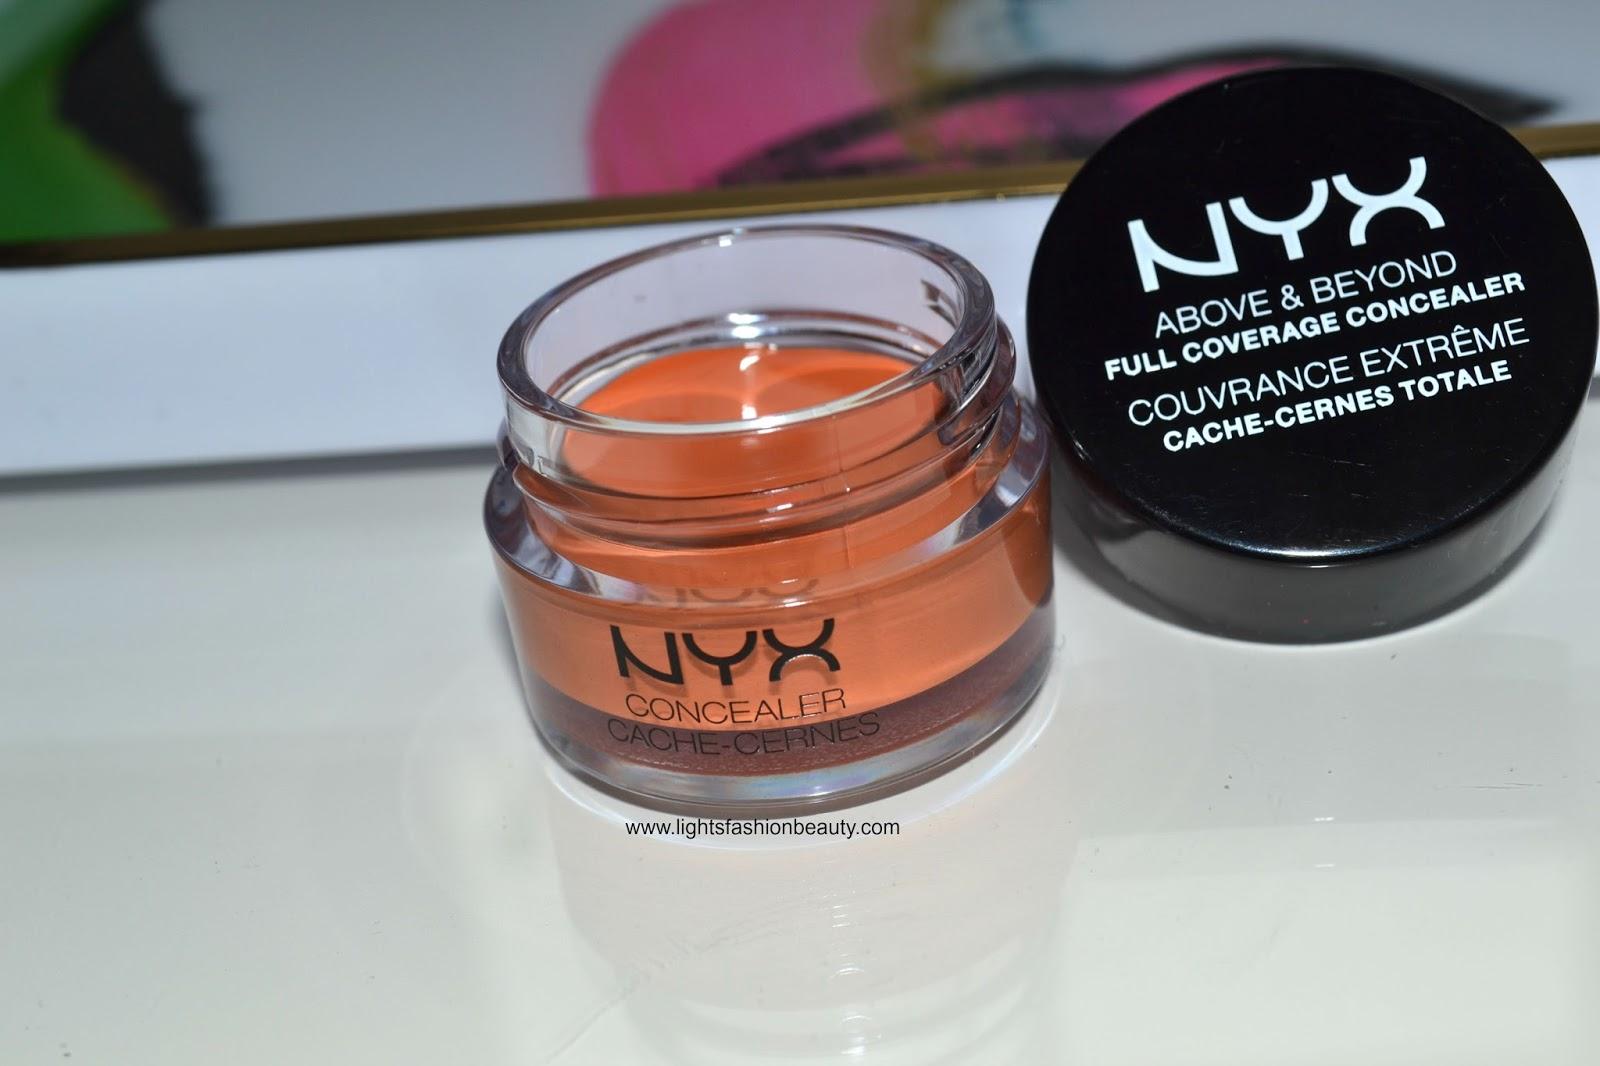 NYX cosmetics Above & Beyond Full Coverage Concealer, drugstore orange concealer, lightsfashionbeauty, drugstore makeup